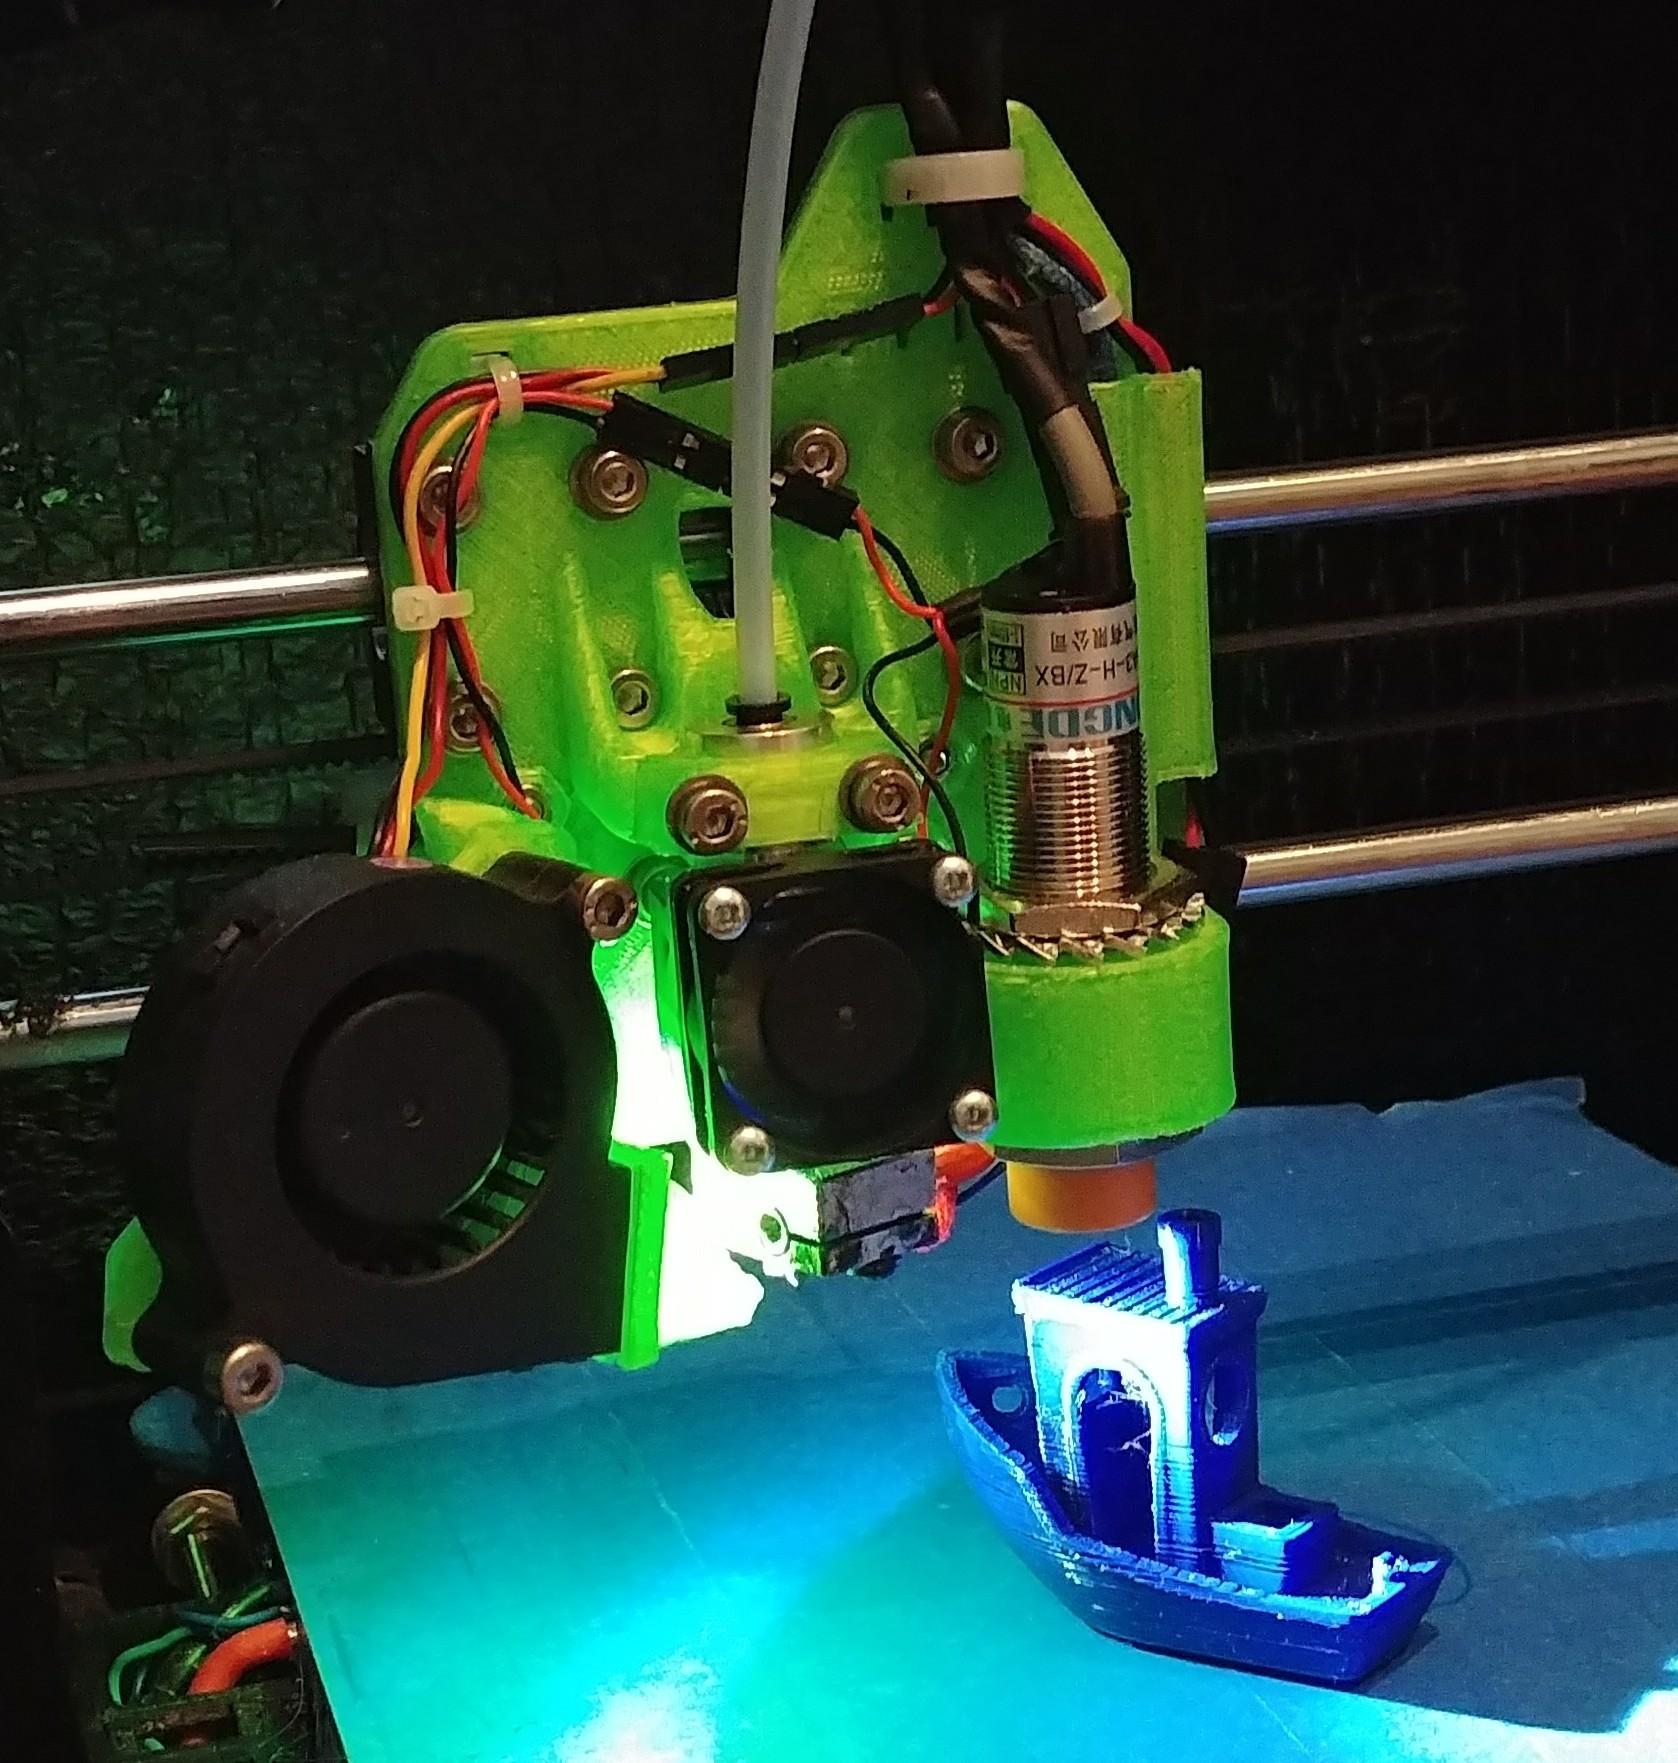 20170815_1007202.jpg Download free STL file Lukestruder - The E3D V6 bowden mount for prusa i3 (Anet A8) • 3D printer design, lukeskymuh